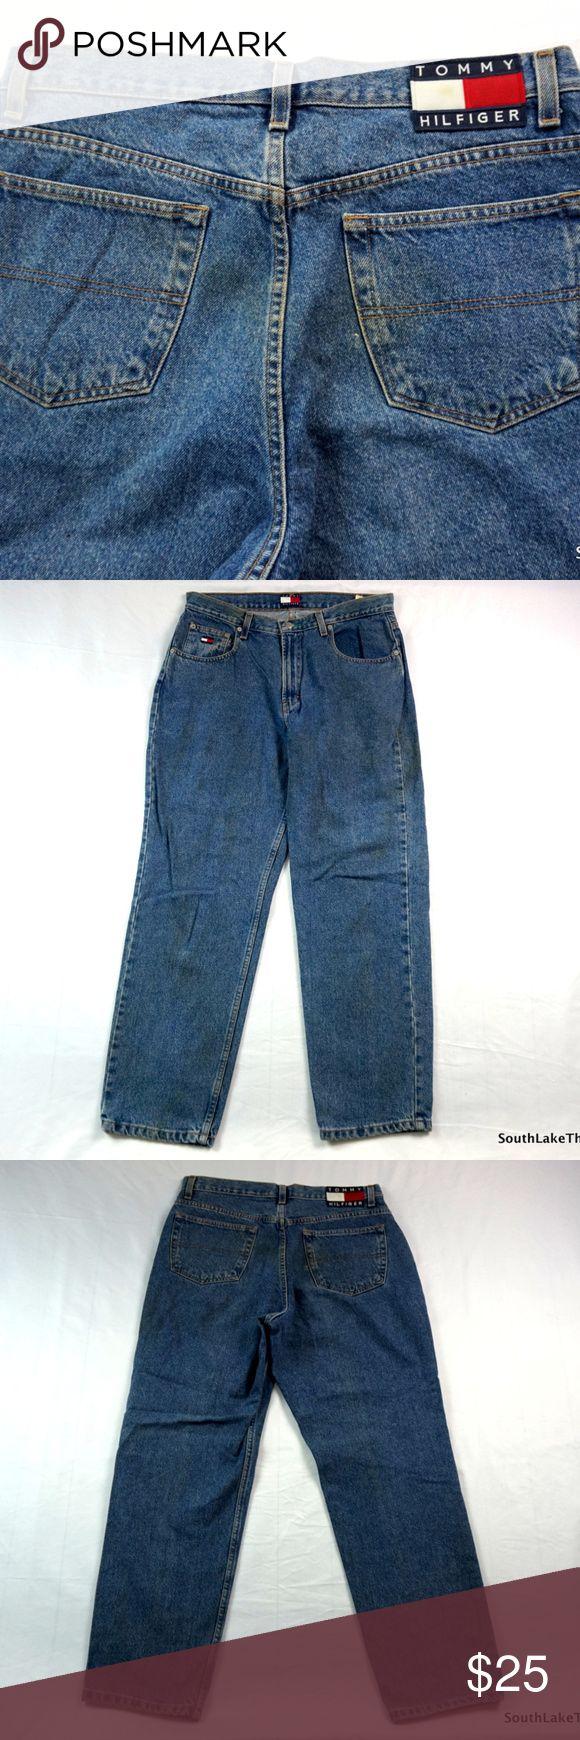 "VTG Tommy Hilfiger Flag Logo Jeans Men's Size 33 Tommy Hilfiger Tommy Jeans Denim Blue Jeans - Adult Large, L - Great Shape - Tommy Jeans - Rare - vtg - vintage - polo by Ralph Lauren - designer  Brand:      Tommy Hilfiger Size:         Men's Size 33 Type:        Pants (Blue Jeans) Material:  Denim  Measurements: Waist Measures:  33"" inches Inseam:                30"" inches Length:                 40.5"" Inches Tommy Hilfiger Jeans Relaxed"